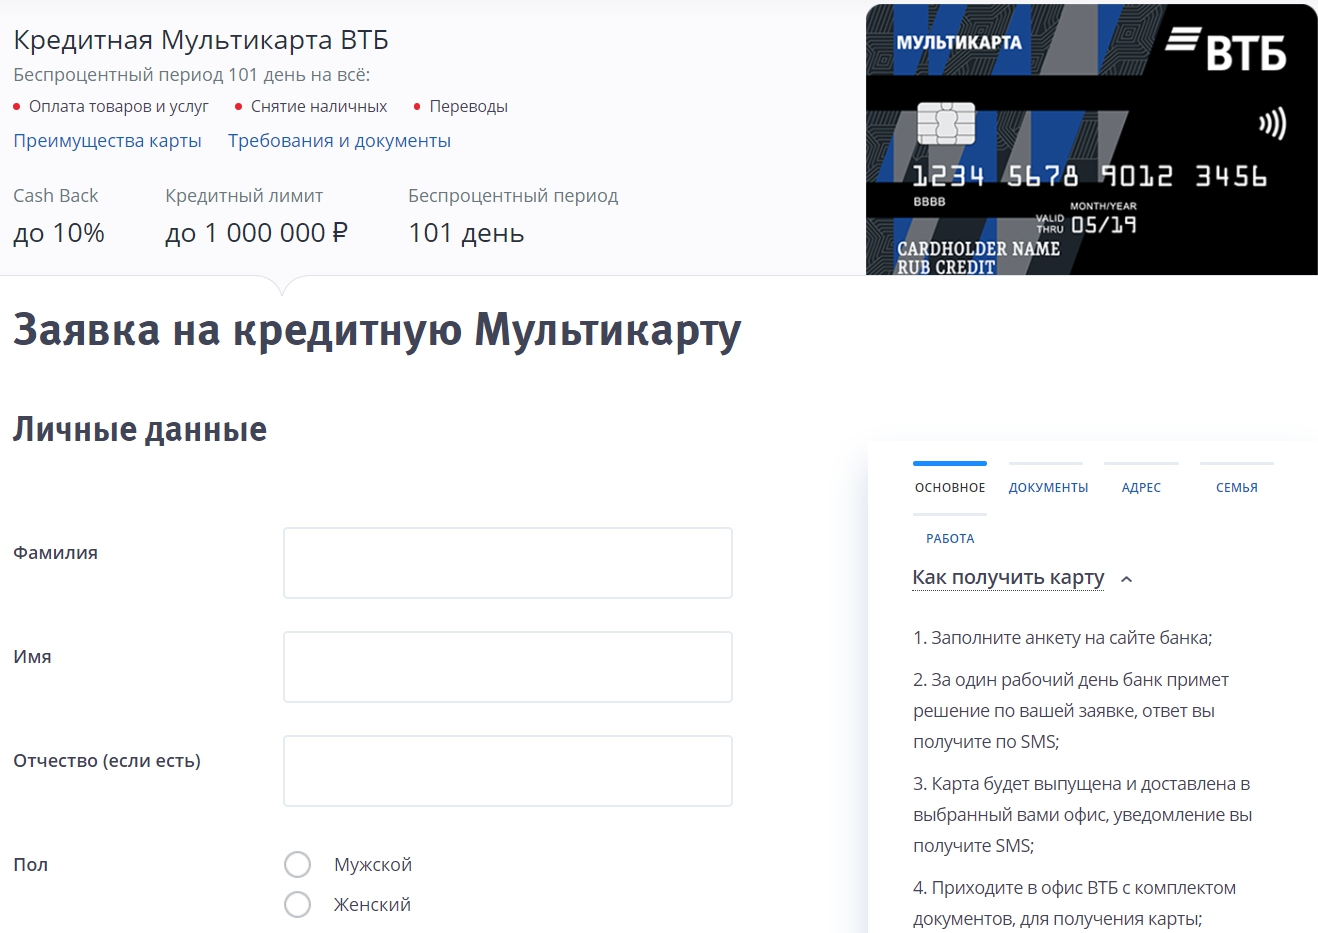 заявка на кредитную карту онлайн ответ сразу во все банки райффайзенбанк условия кредитования физических лиц краснодар